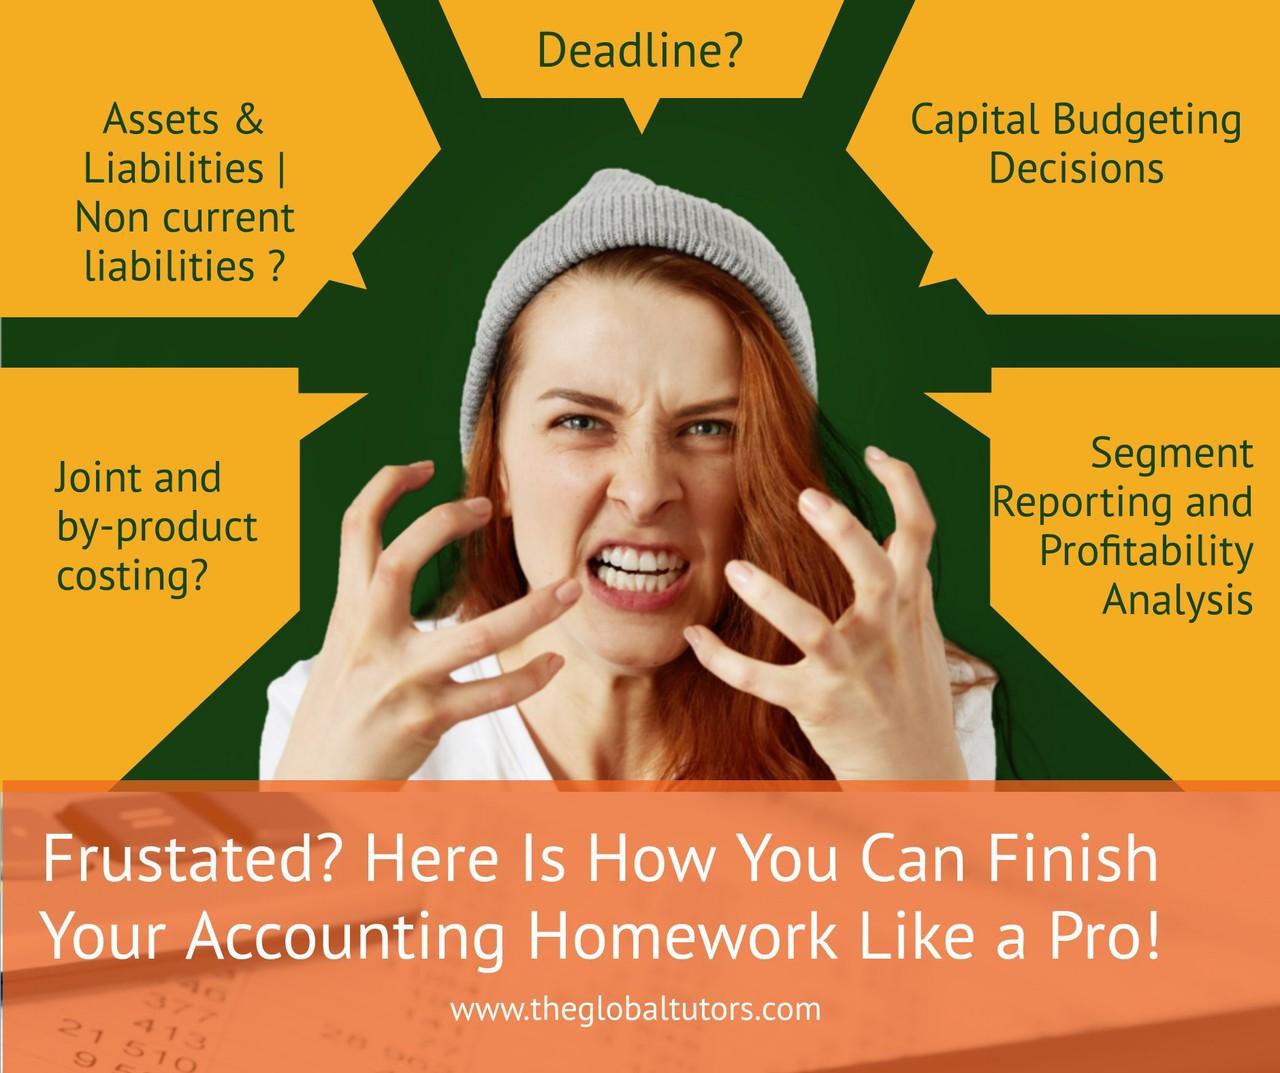 Accounting Homework Like a Pro